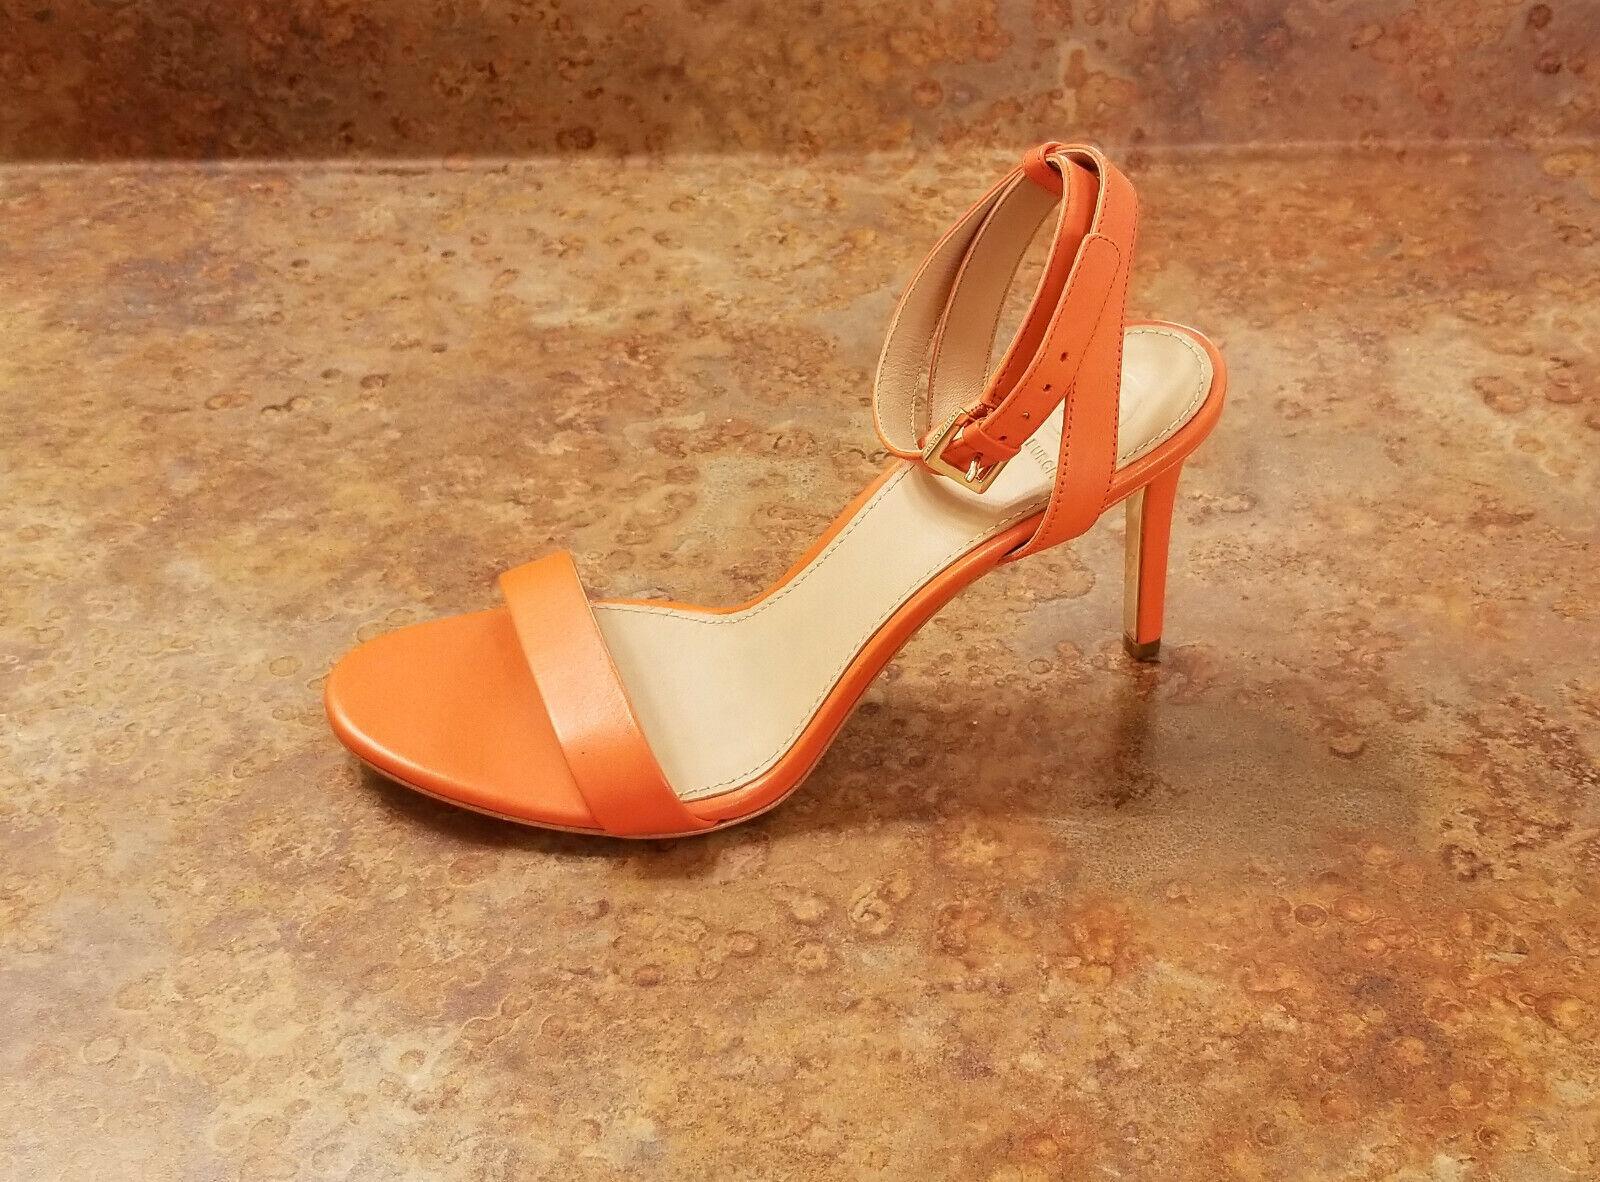 New  Tory Burch 'Elana' Ankle Strap Sandals orange Leather Women 7.5 M MSRP  295